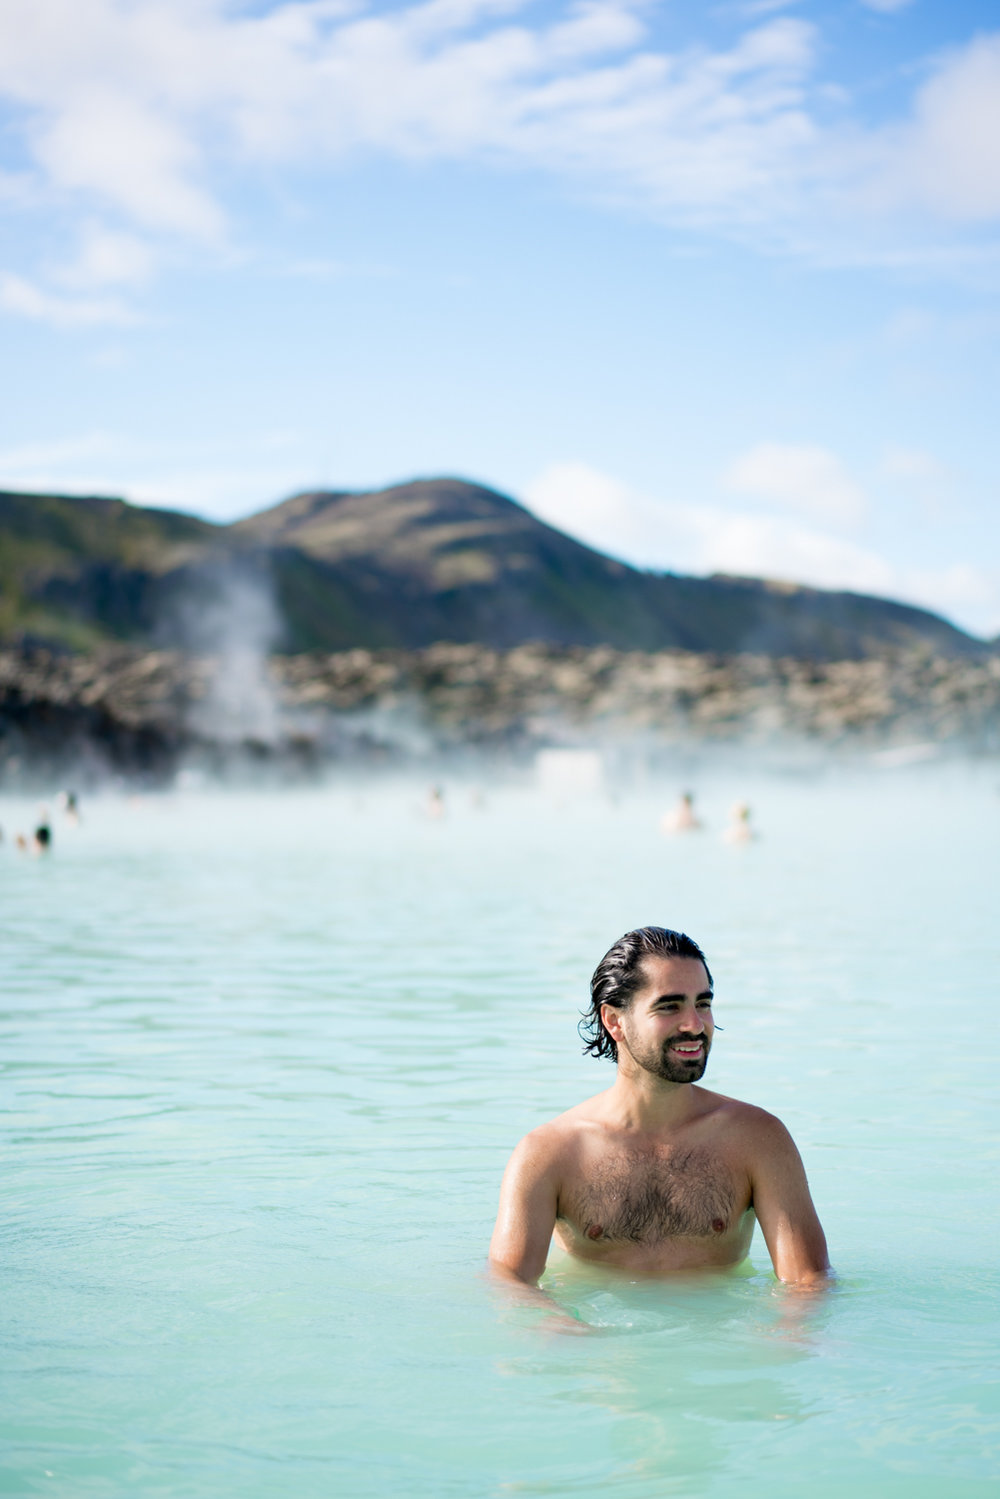 blue lagoon iceland amanda lee austin paz